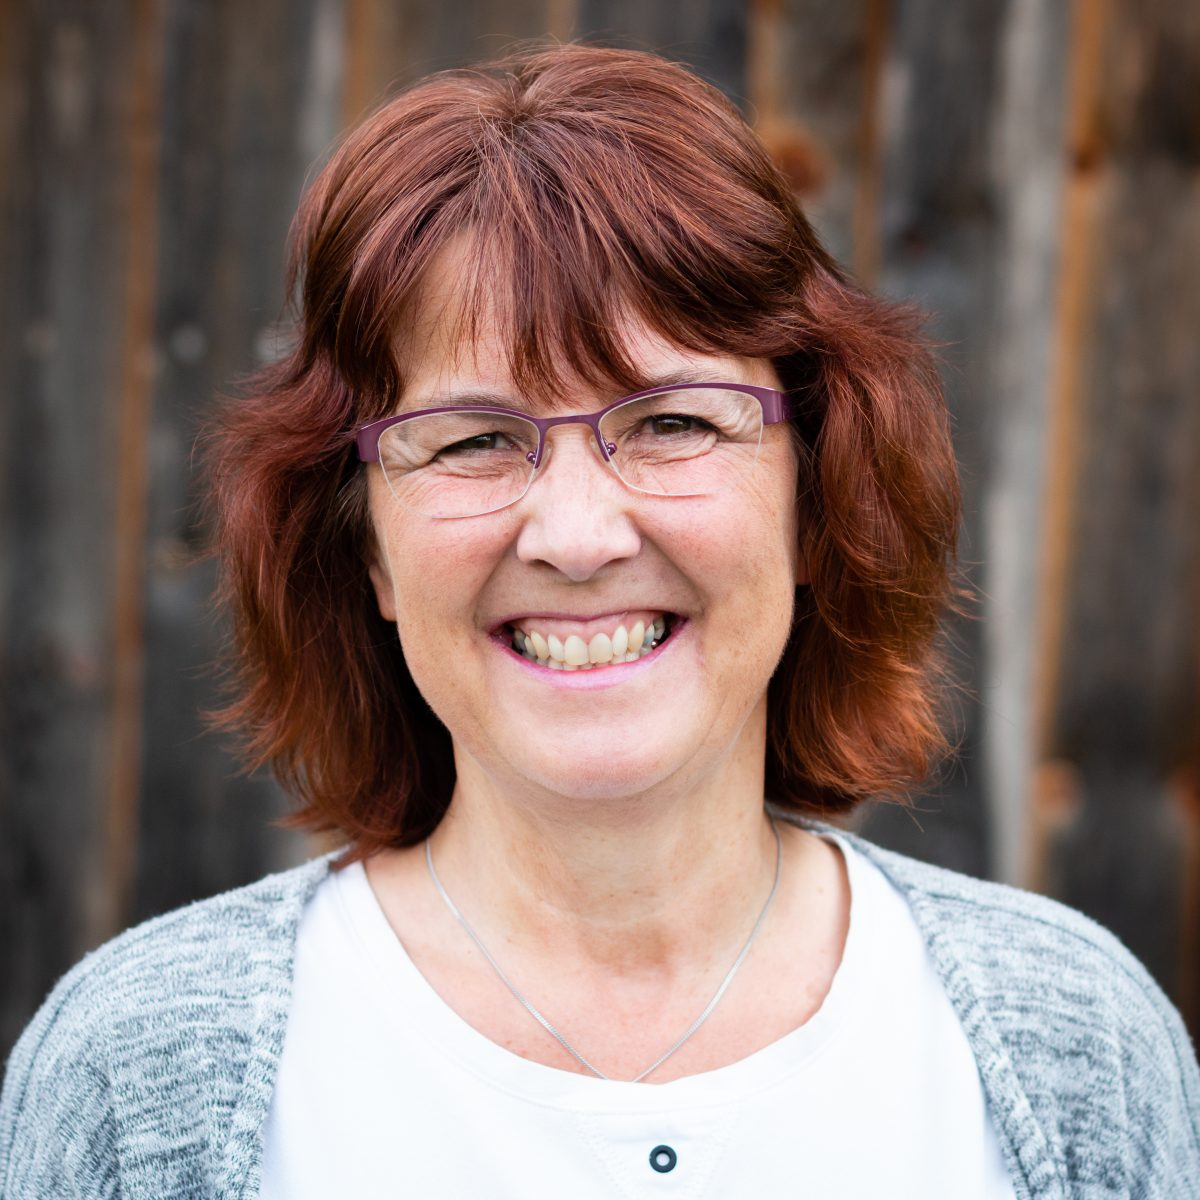 Anette Krumm